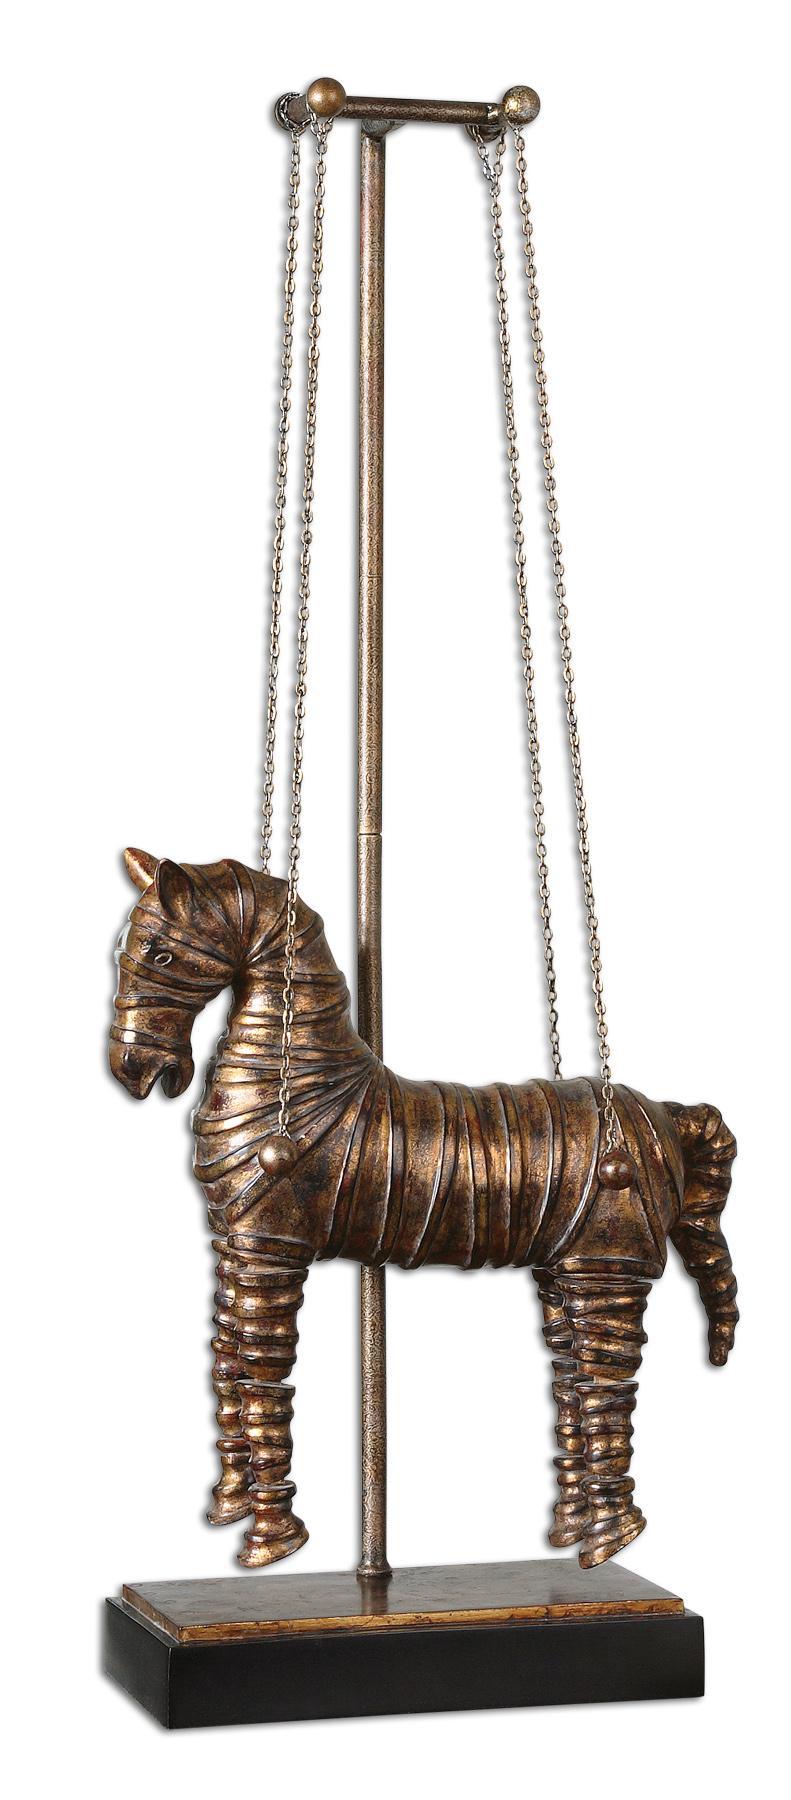 Uttermost Accessories Stedman Horse Sculpture - Item Number: 19587